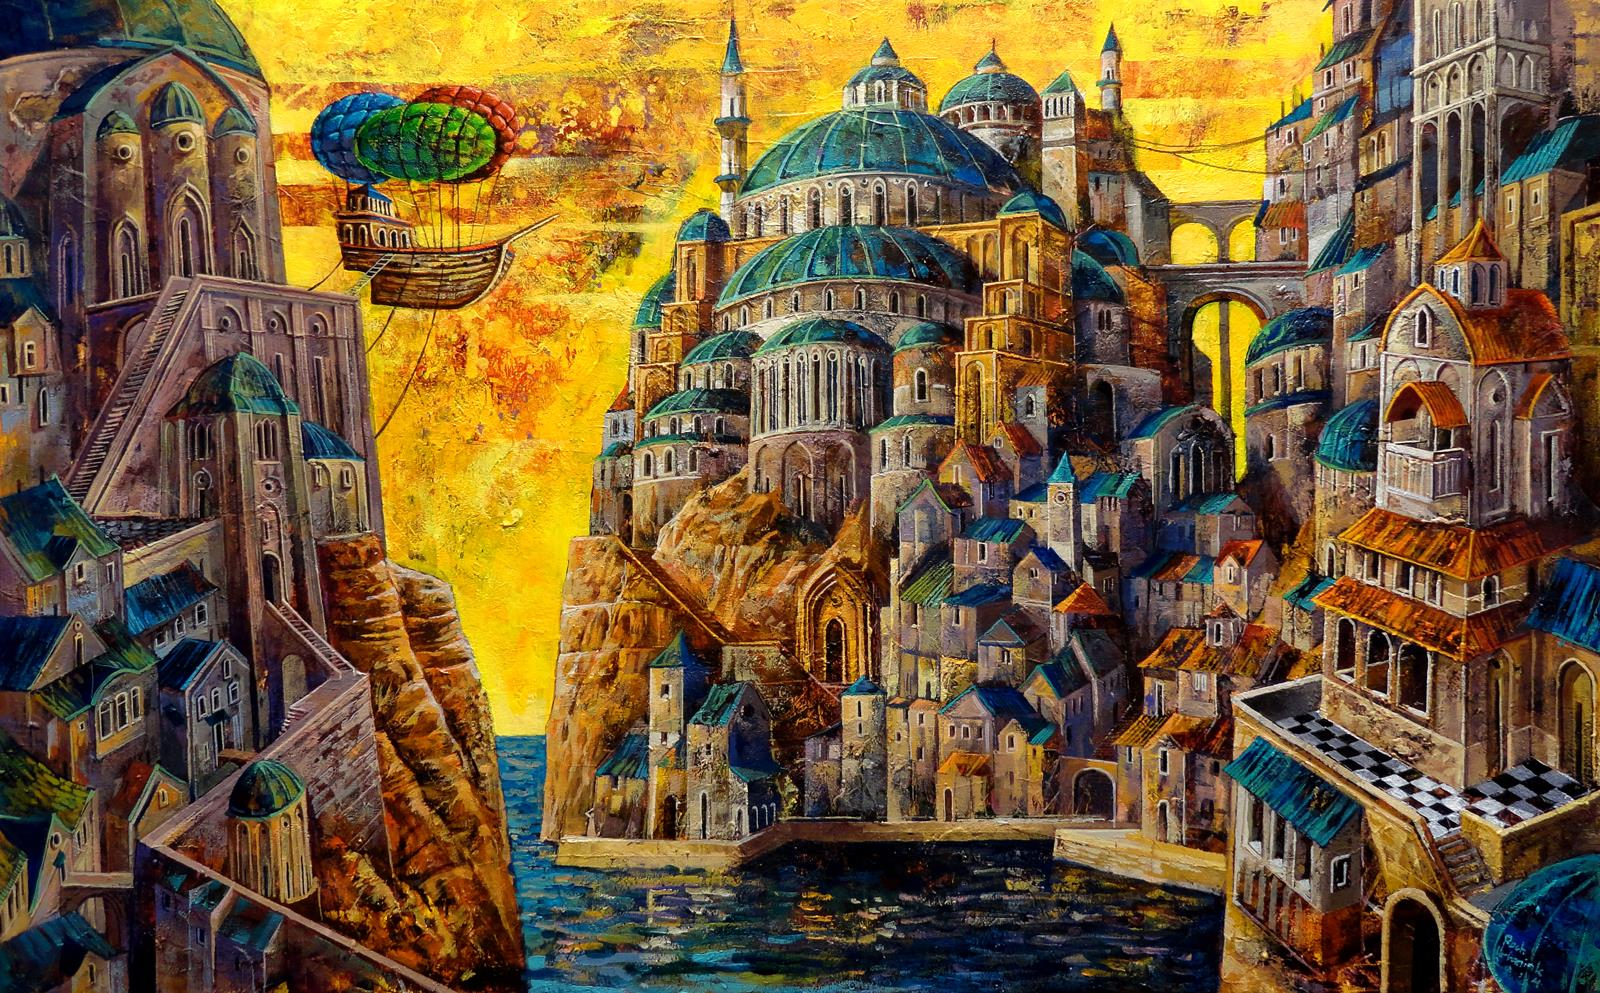 acrylic on canvas    50 cm x 80 cm       Roch Urbaniak (3).jpg